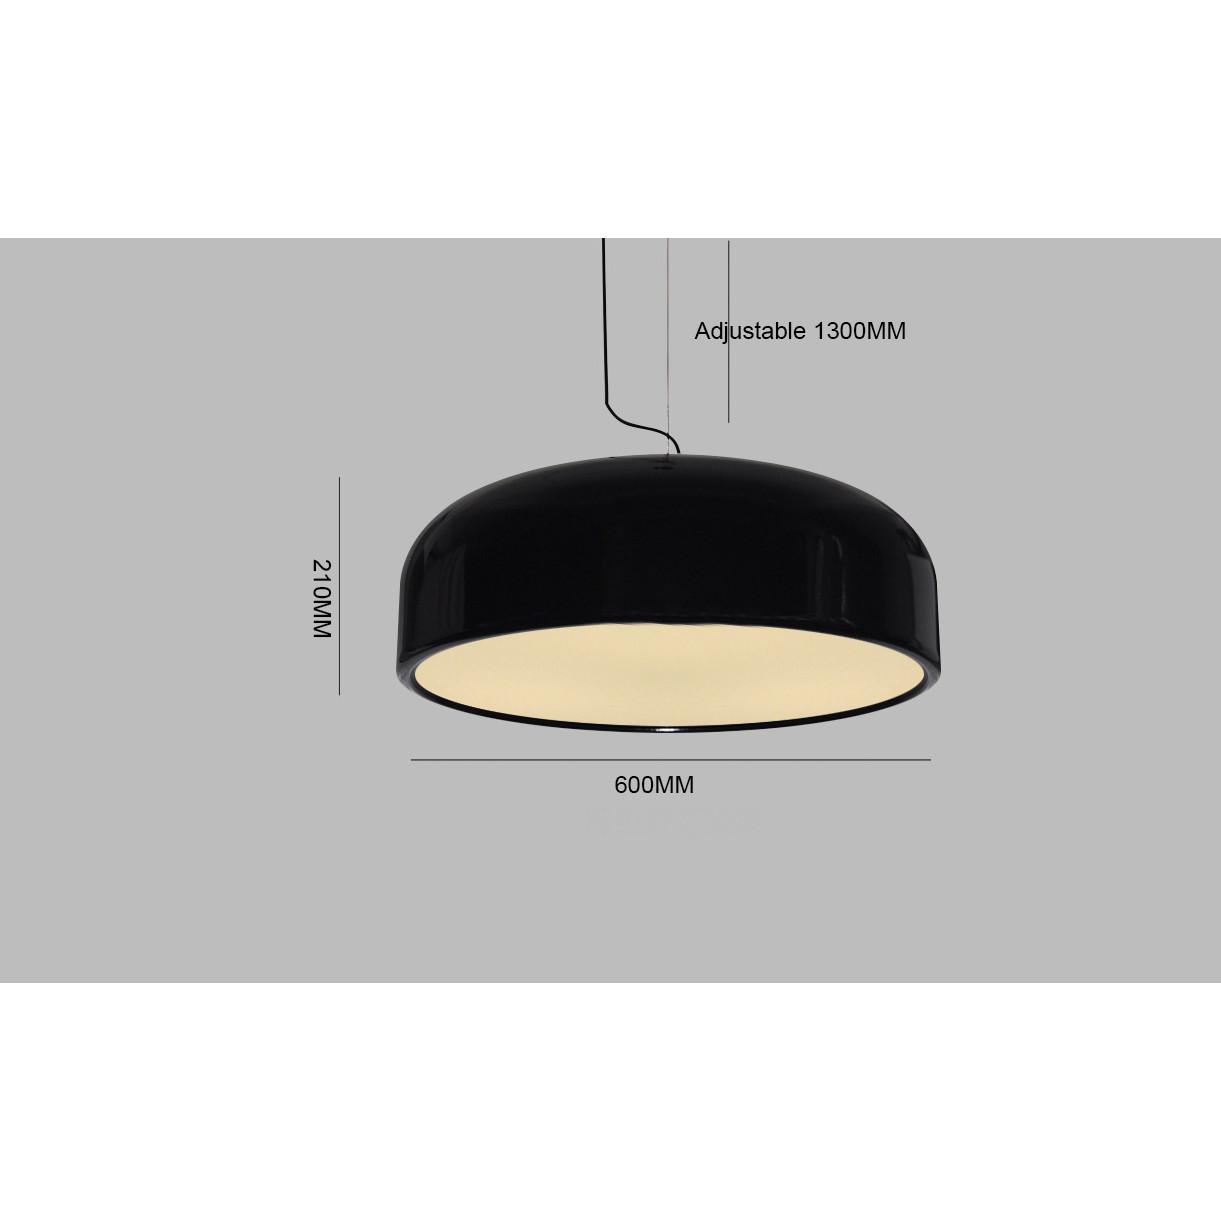 kitchen pendant track lighting fixtures copy. loading zoom kitchen pendant track lighting fixtures copy